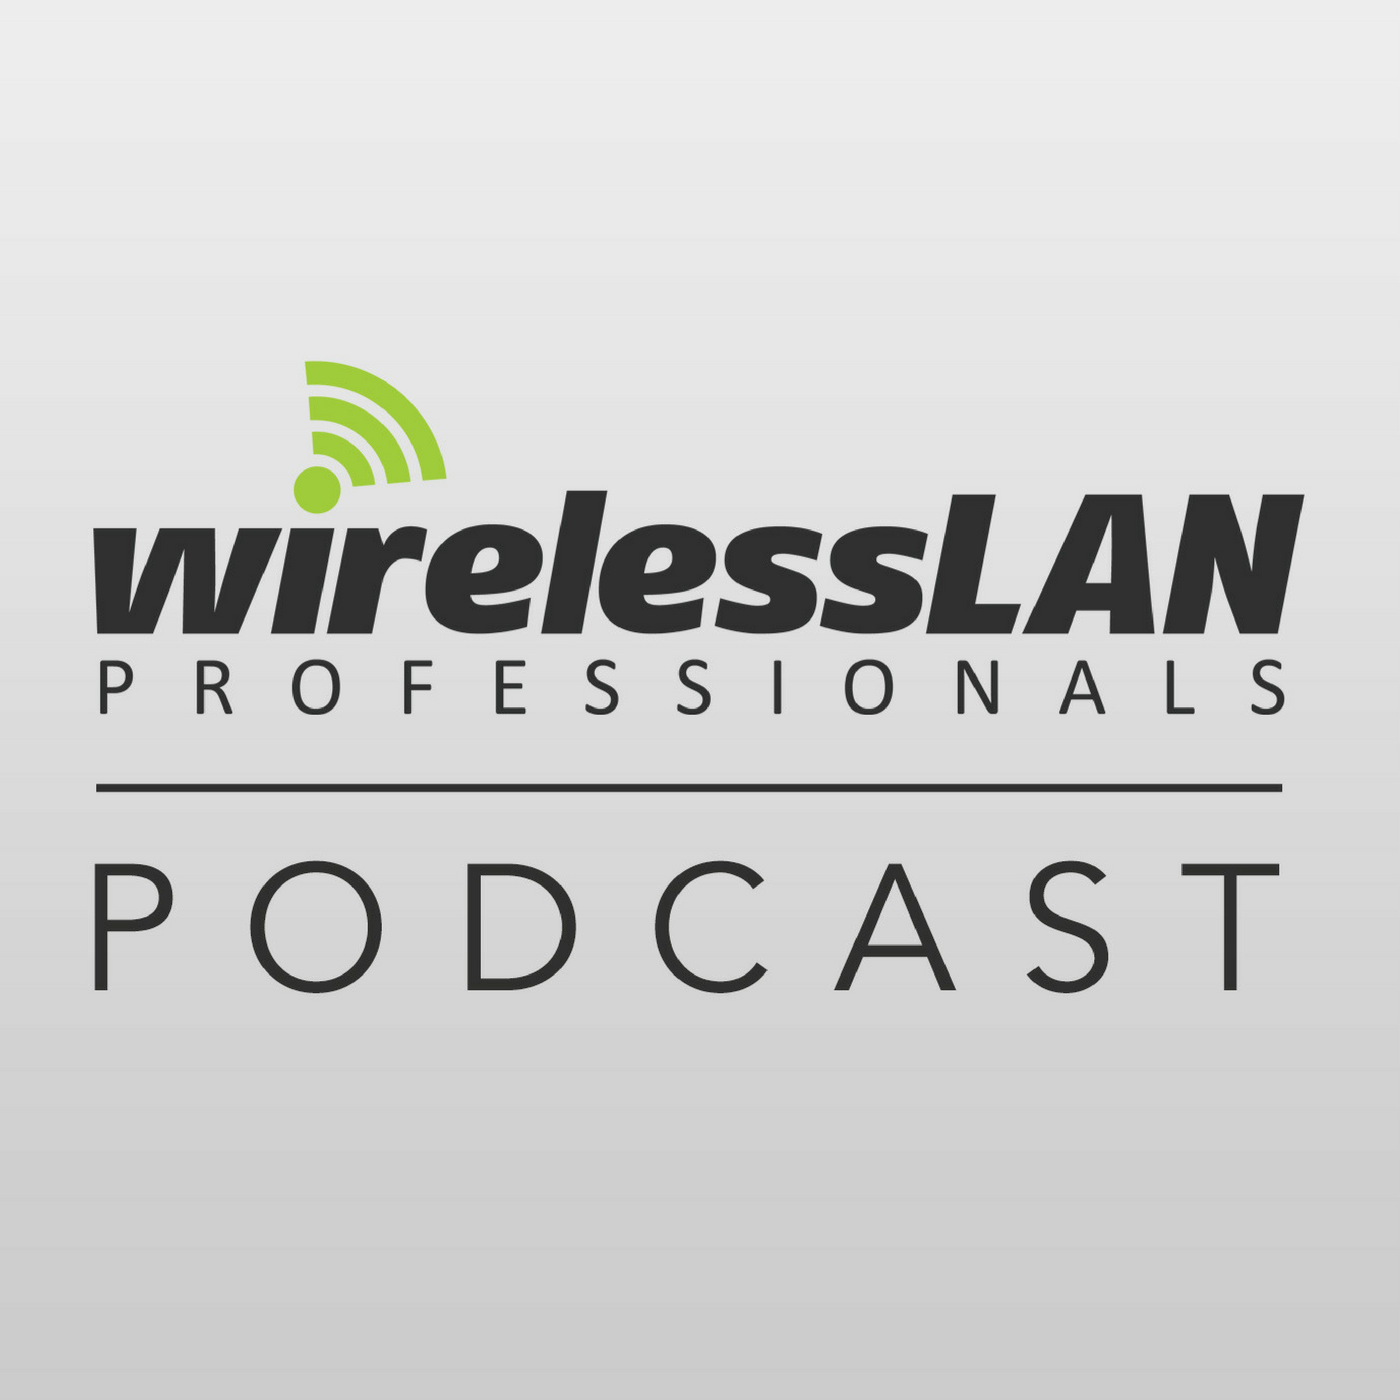 Wireless LAN Professionals Podcast show art